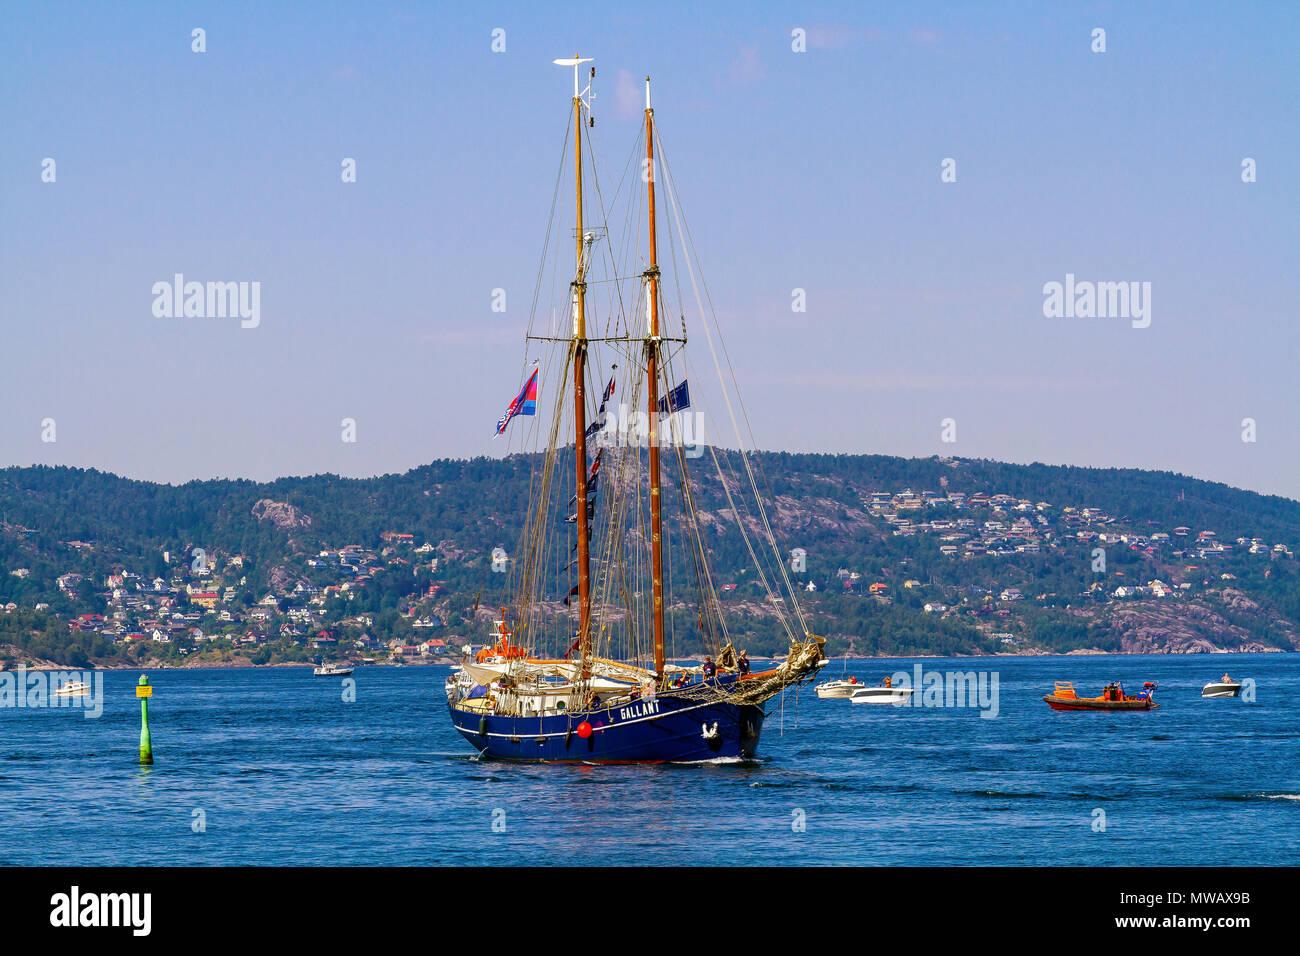 Tall Ships Race Bergen Norway 2014.  The Dutch gaff schooner 'Gallant' entering Bergen harbor from Byfjorden. - Stock Image